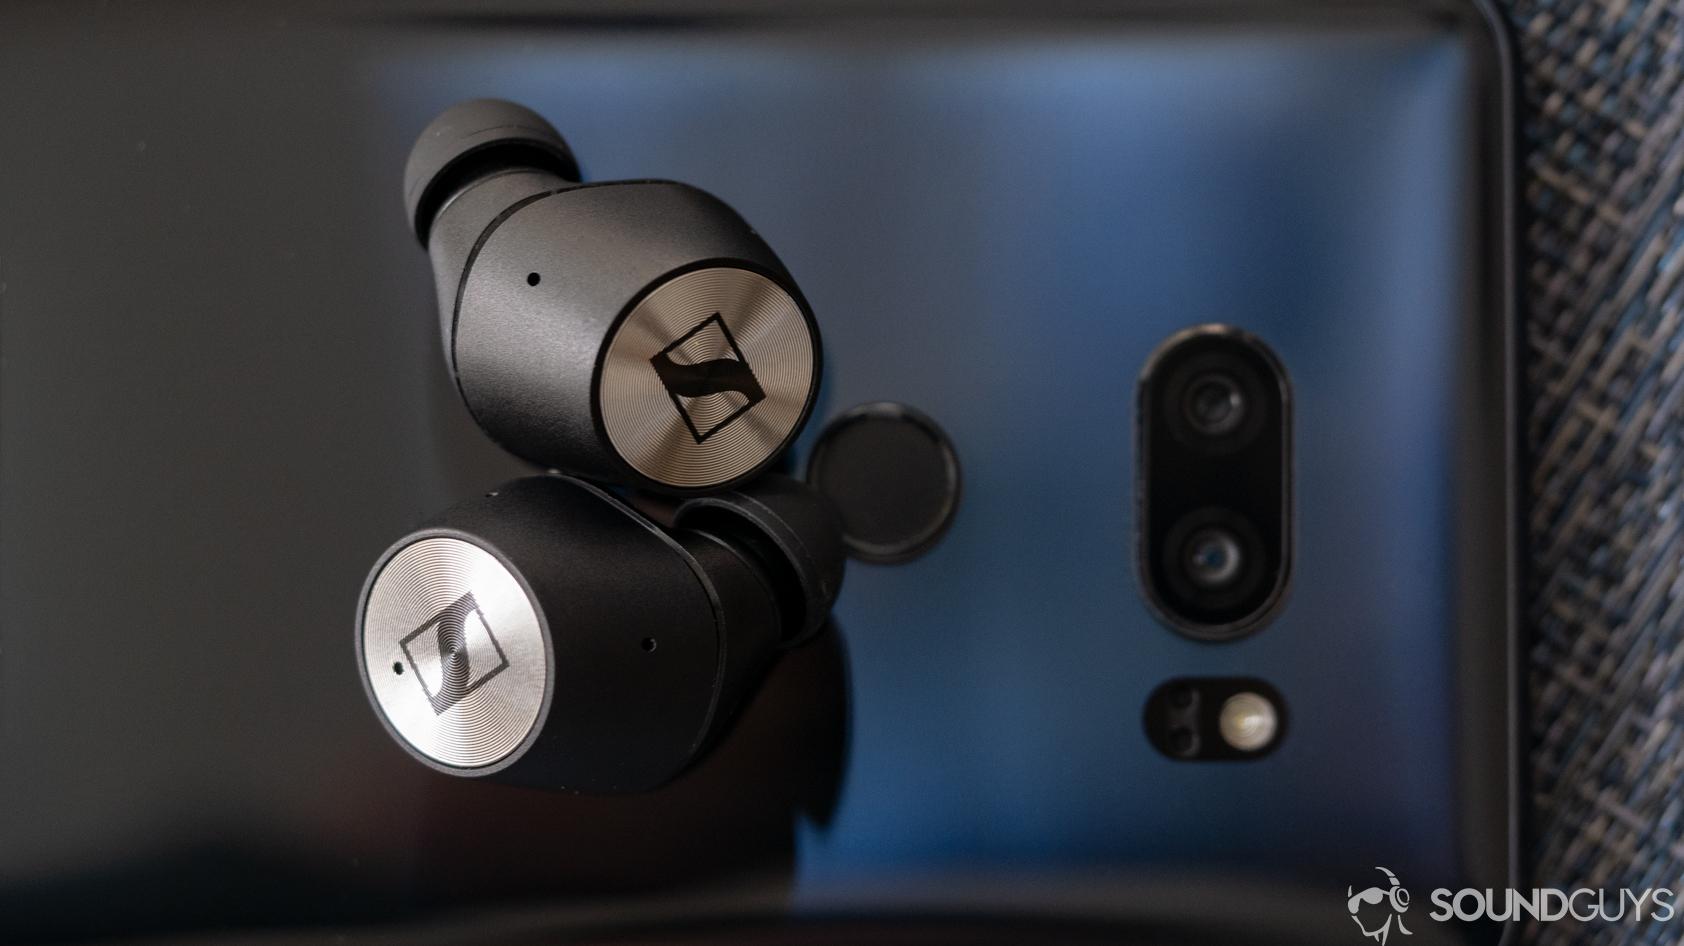 https://www.soundguys.com/wp-content/uploads/2019/01/sennheiser-momentum-true-wireless-phone.jpg